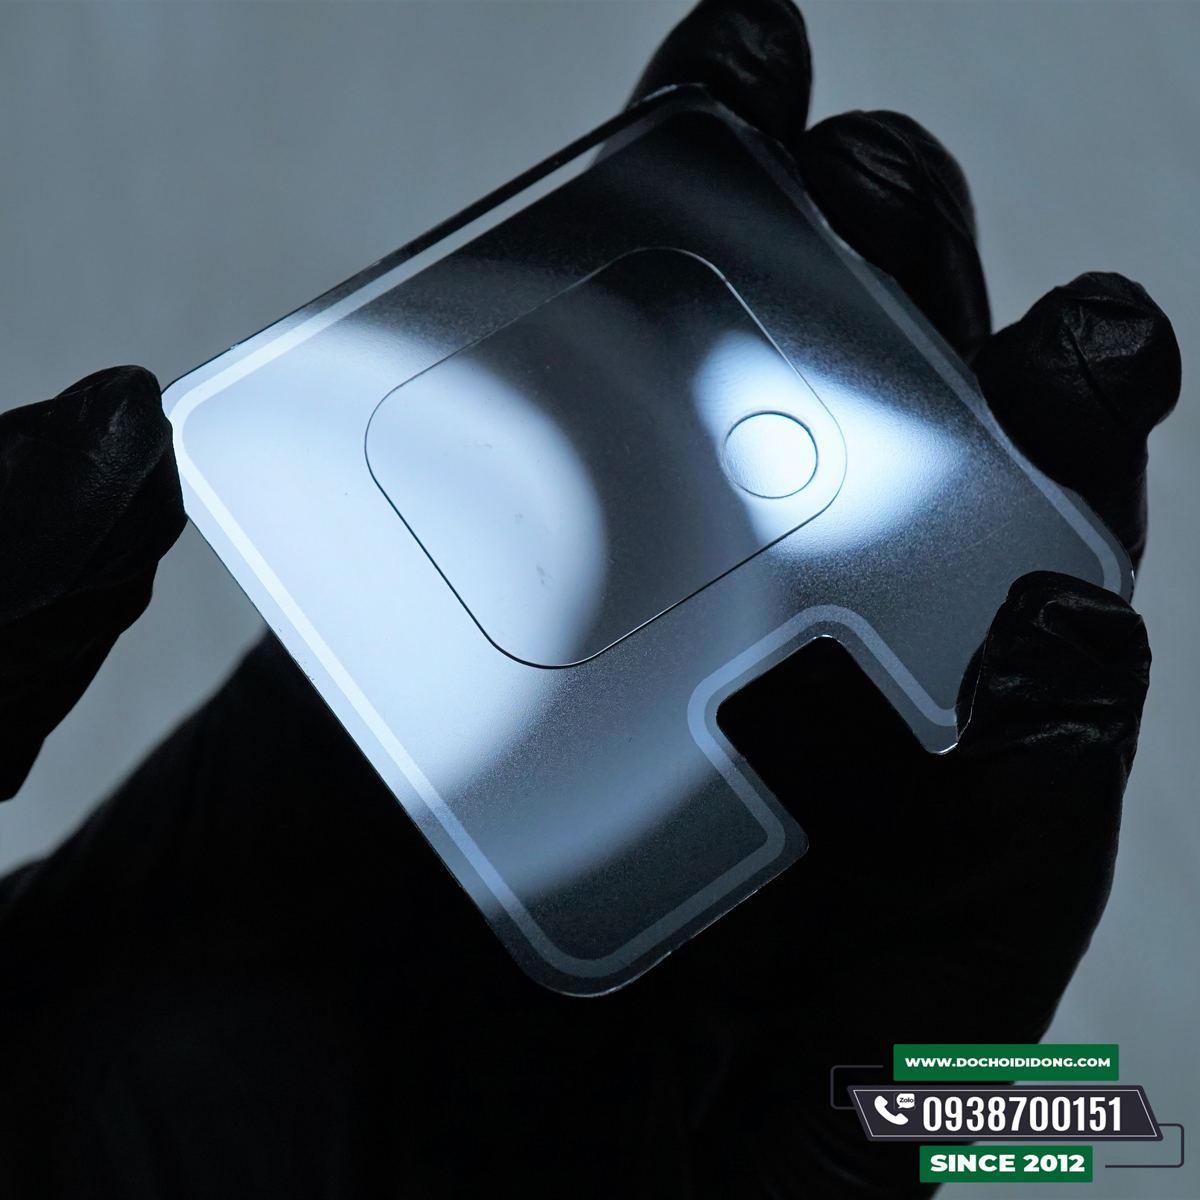 mieng-dan-cuong-luc-camera-samsung-note-10-lite-2-5d